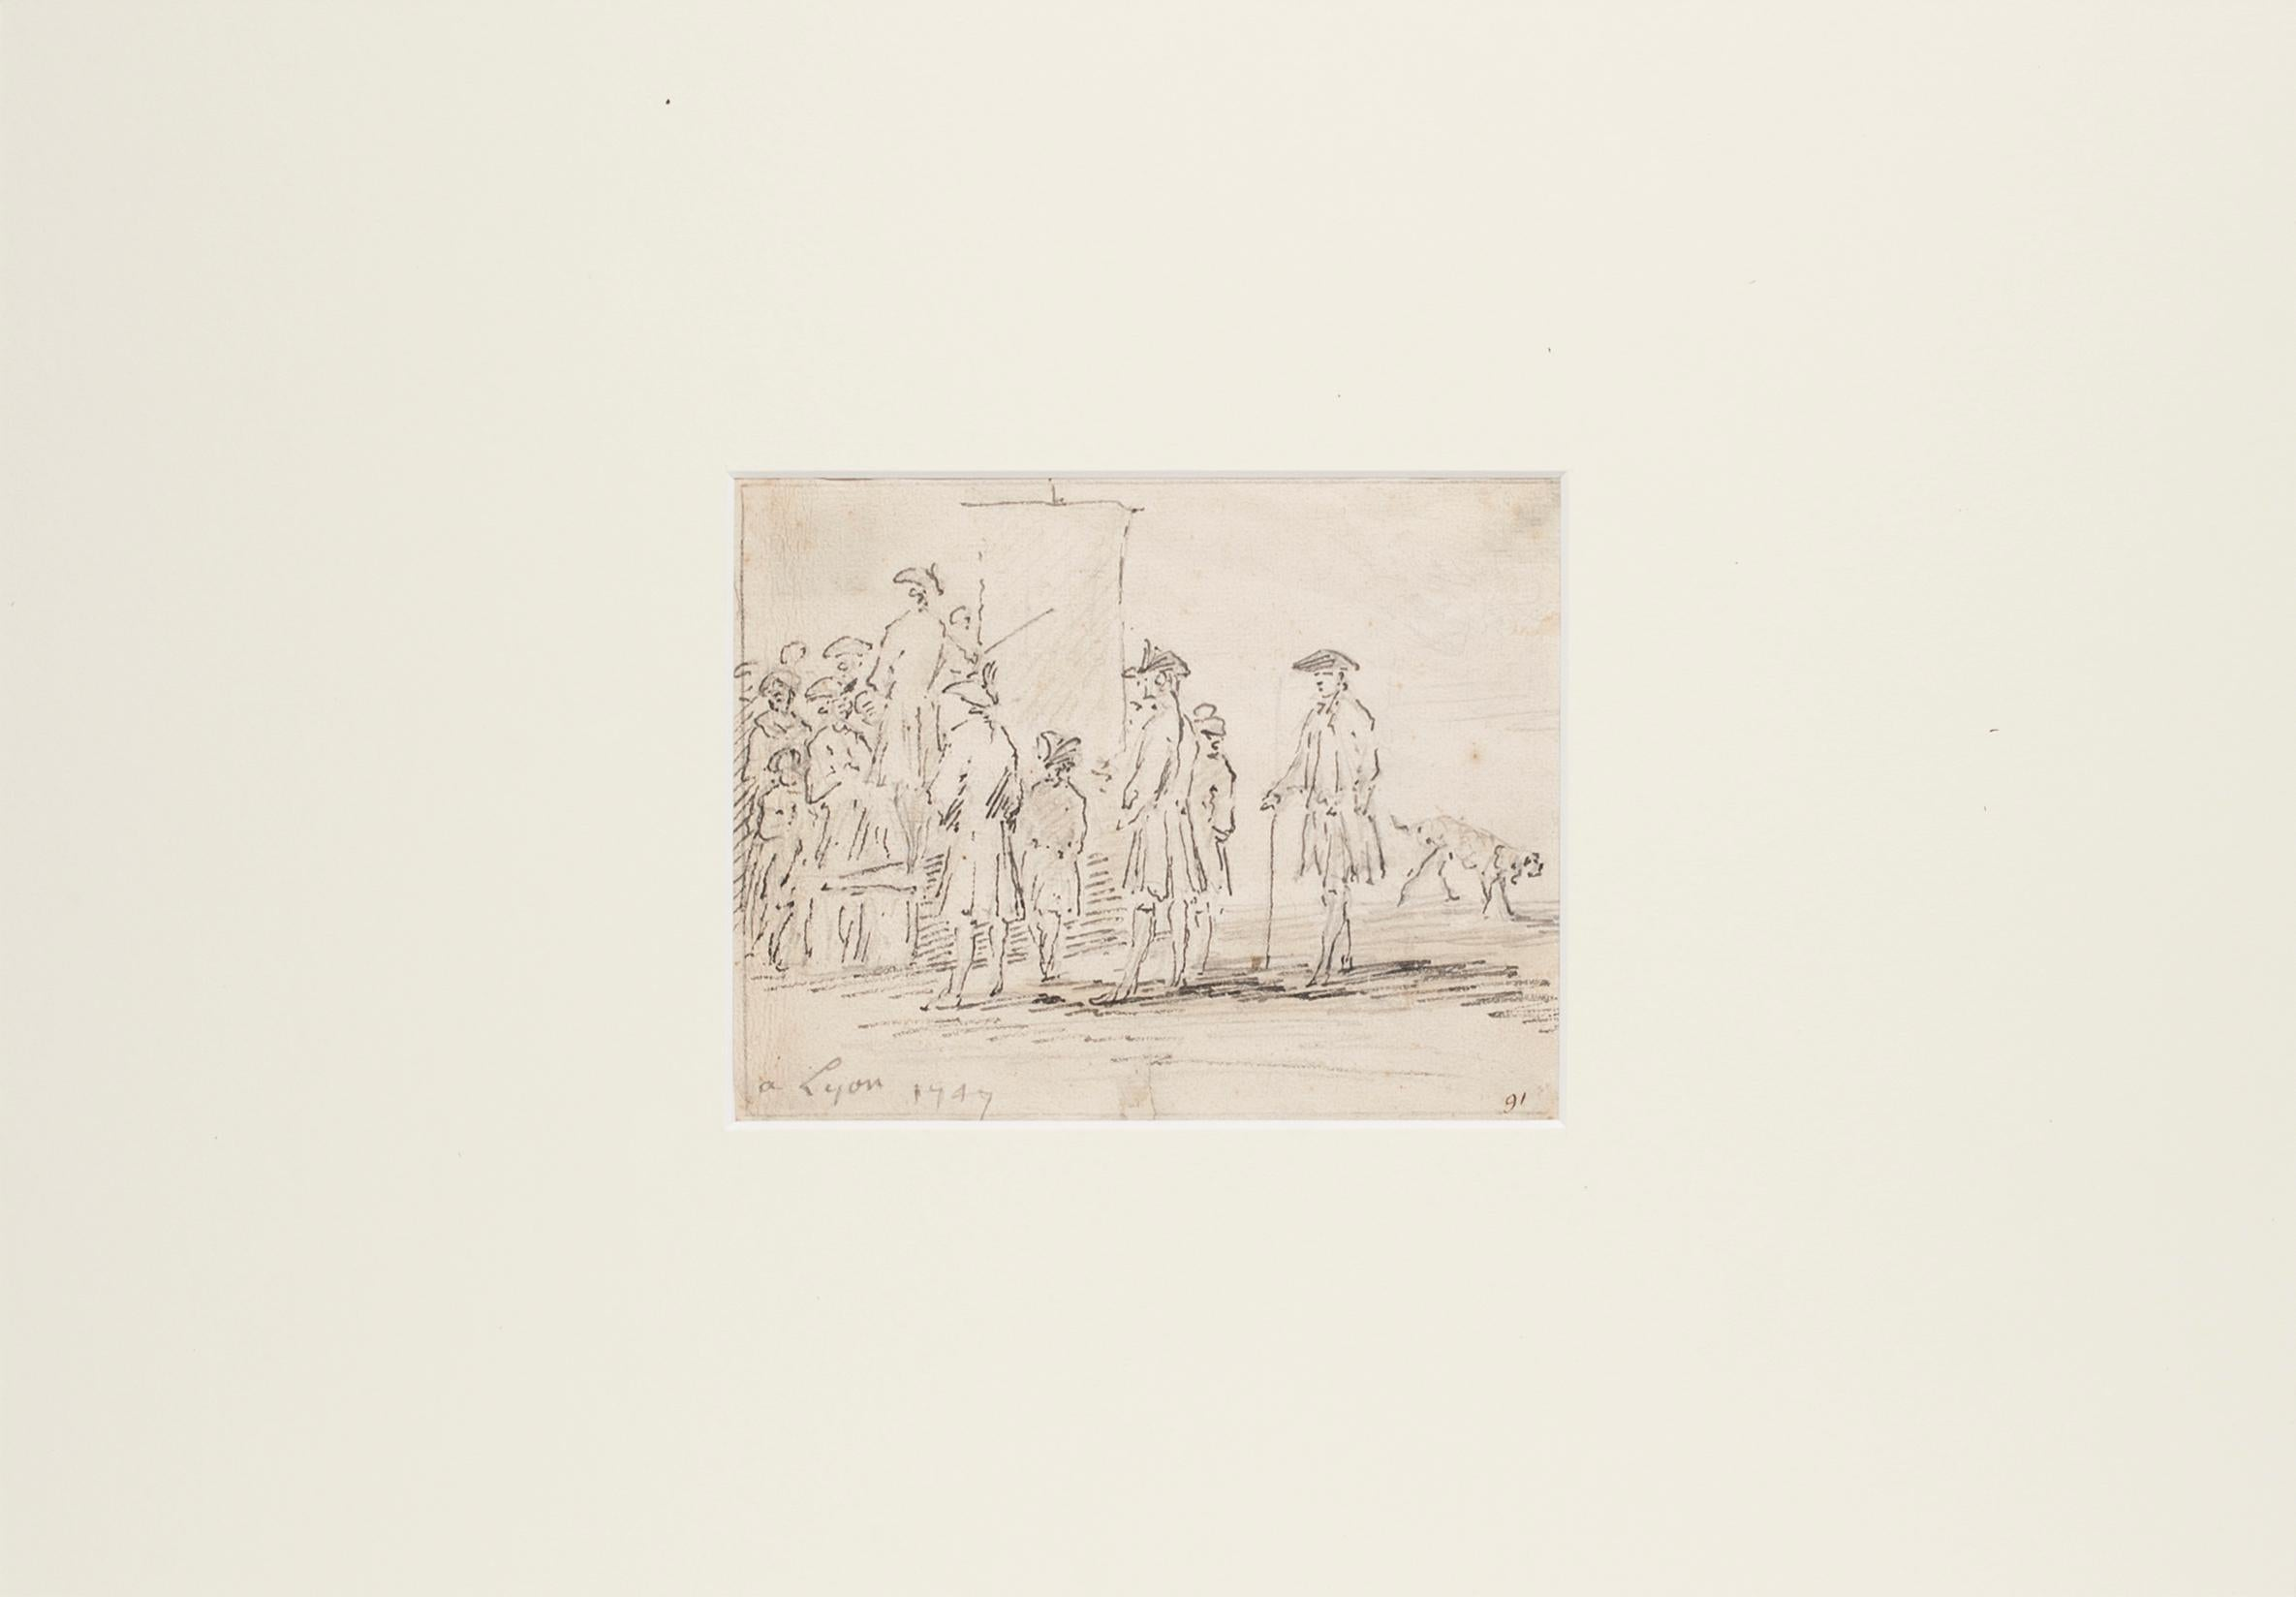 Speech - Original China Ink Drawing by Jan Pieter Verdussen - Mid 1747